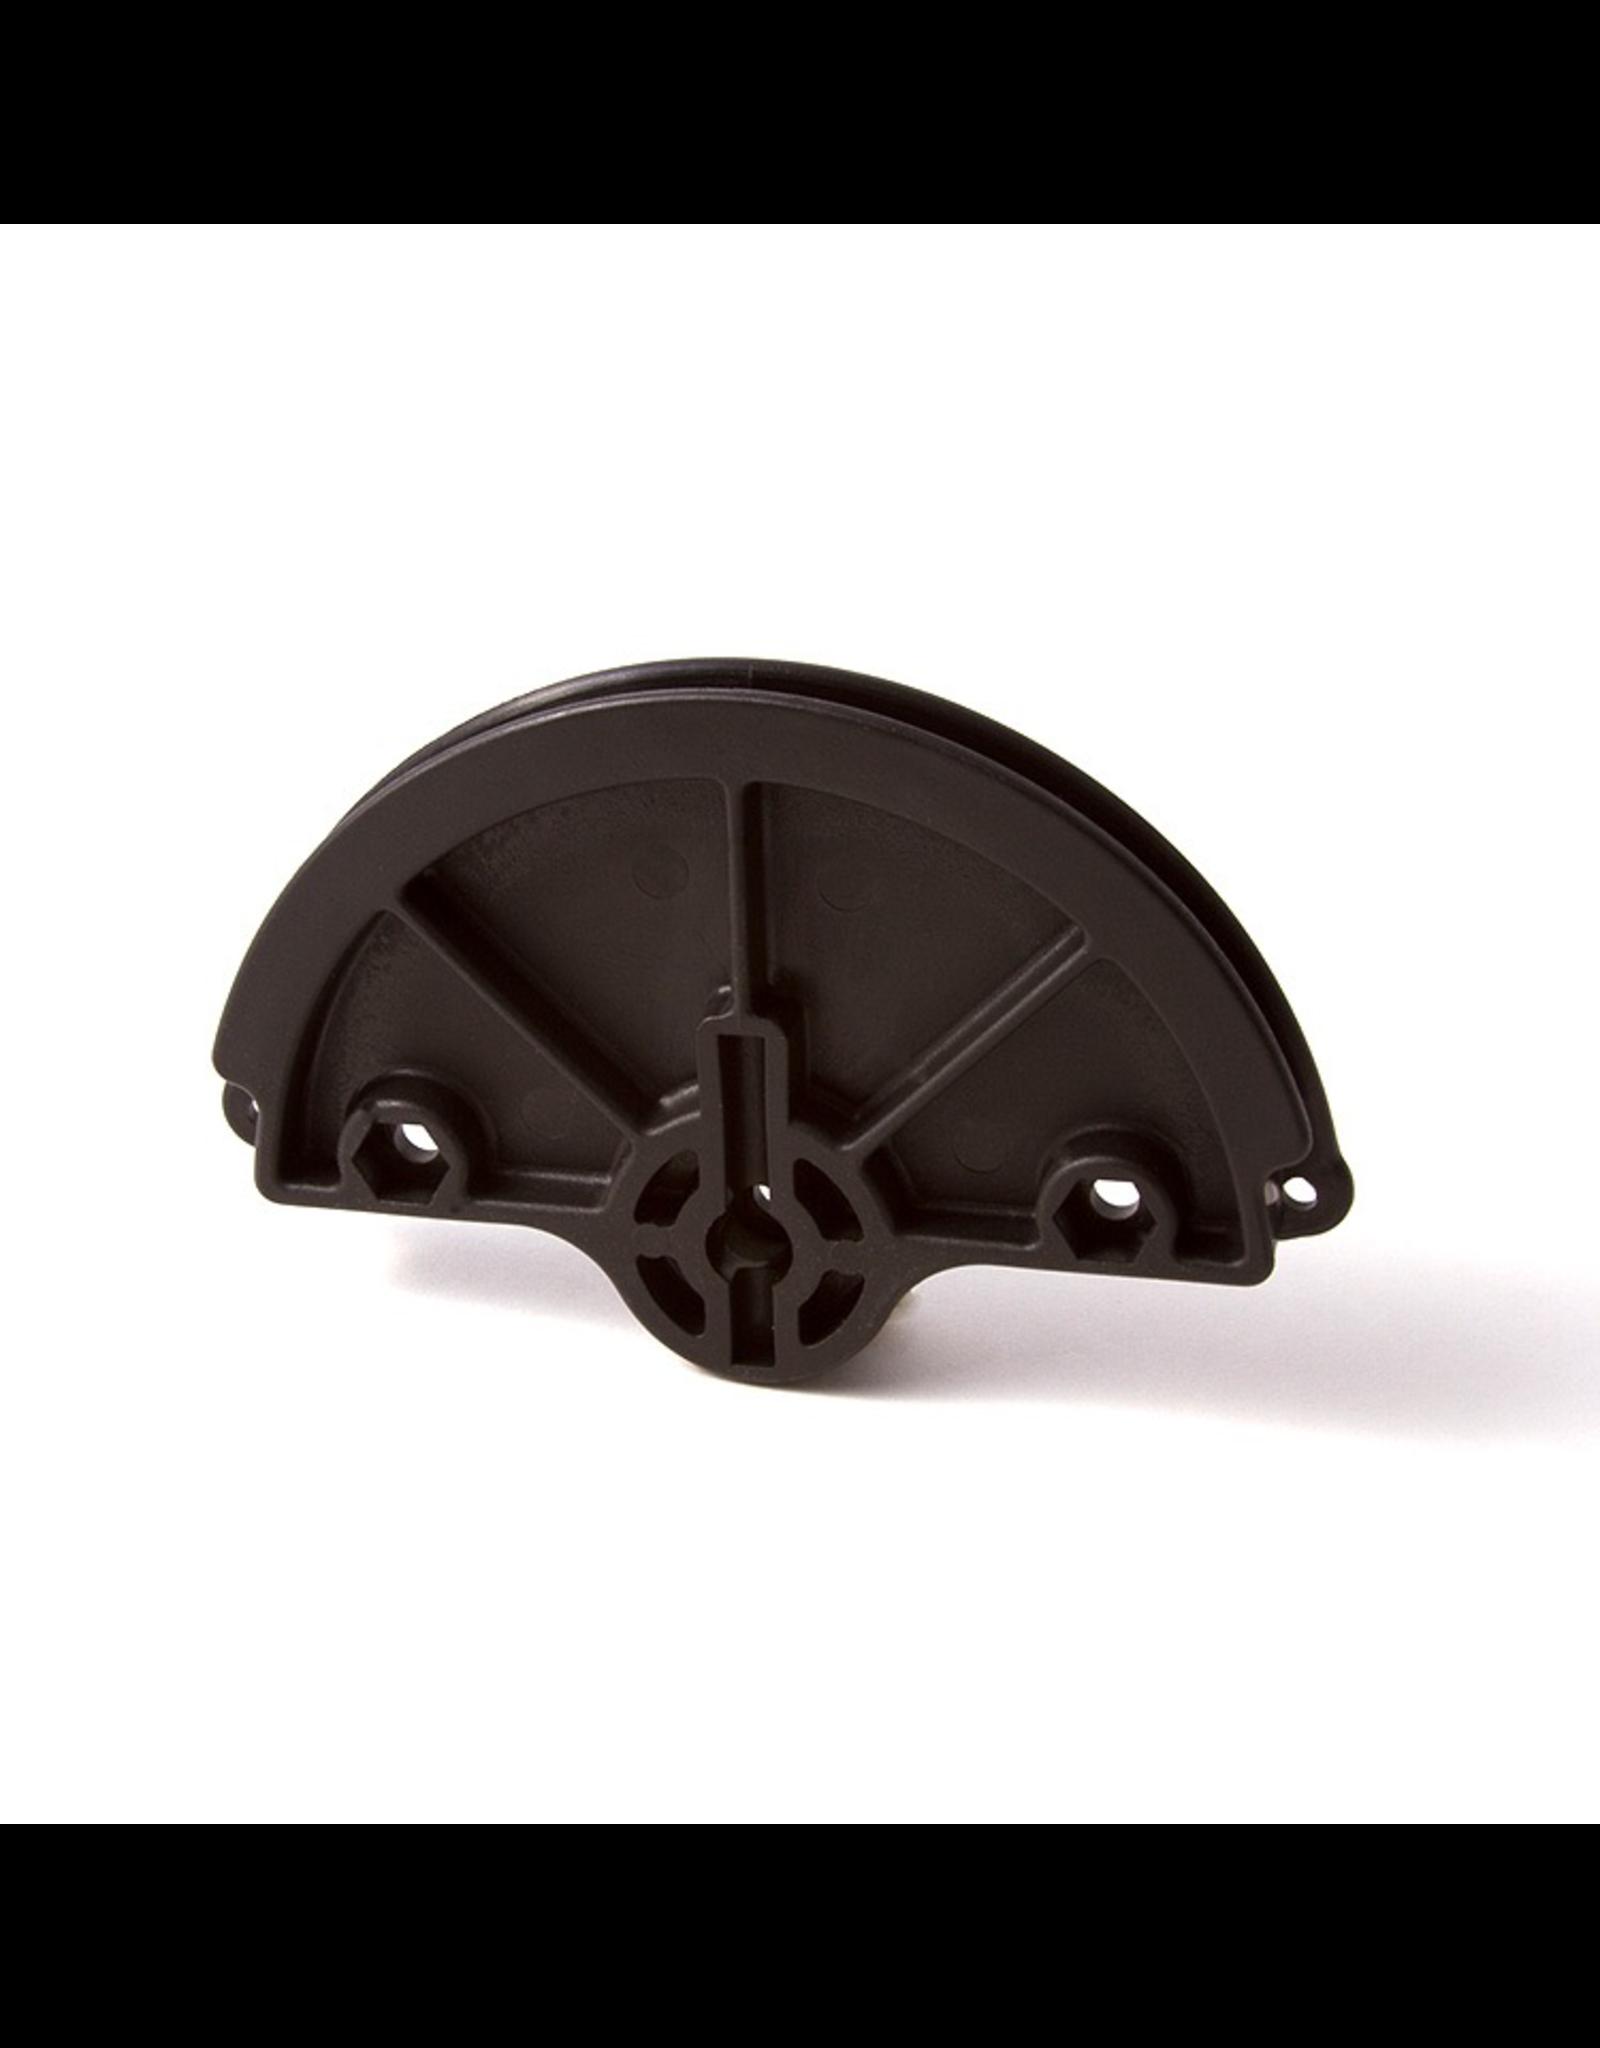 Hobie Hobie Pro Angler Rudder Steering Drum - Screw Style - X-53